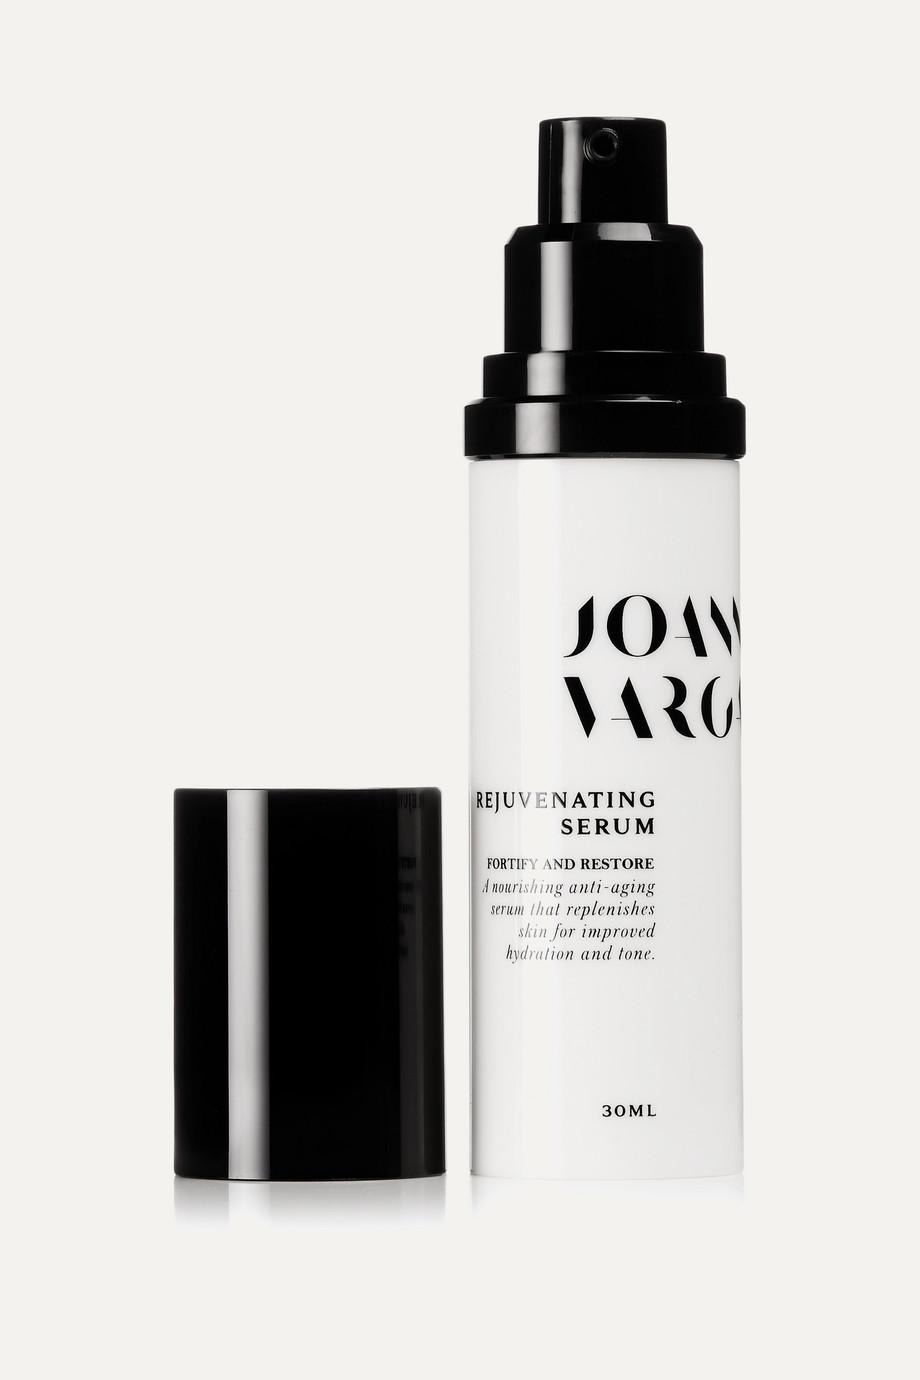 Joanna Vargas Rejuvenating Serum, 30ml